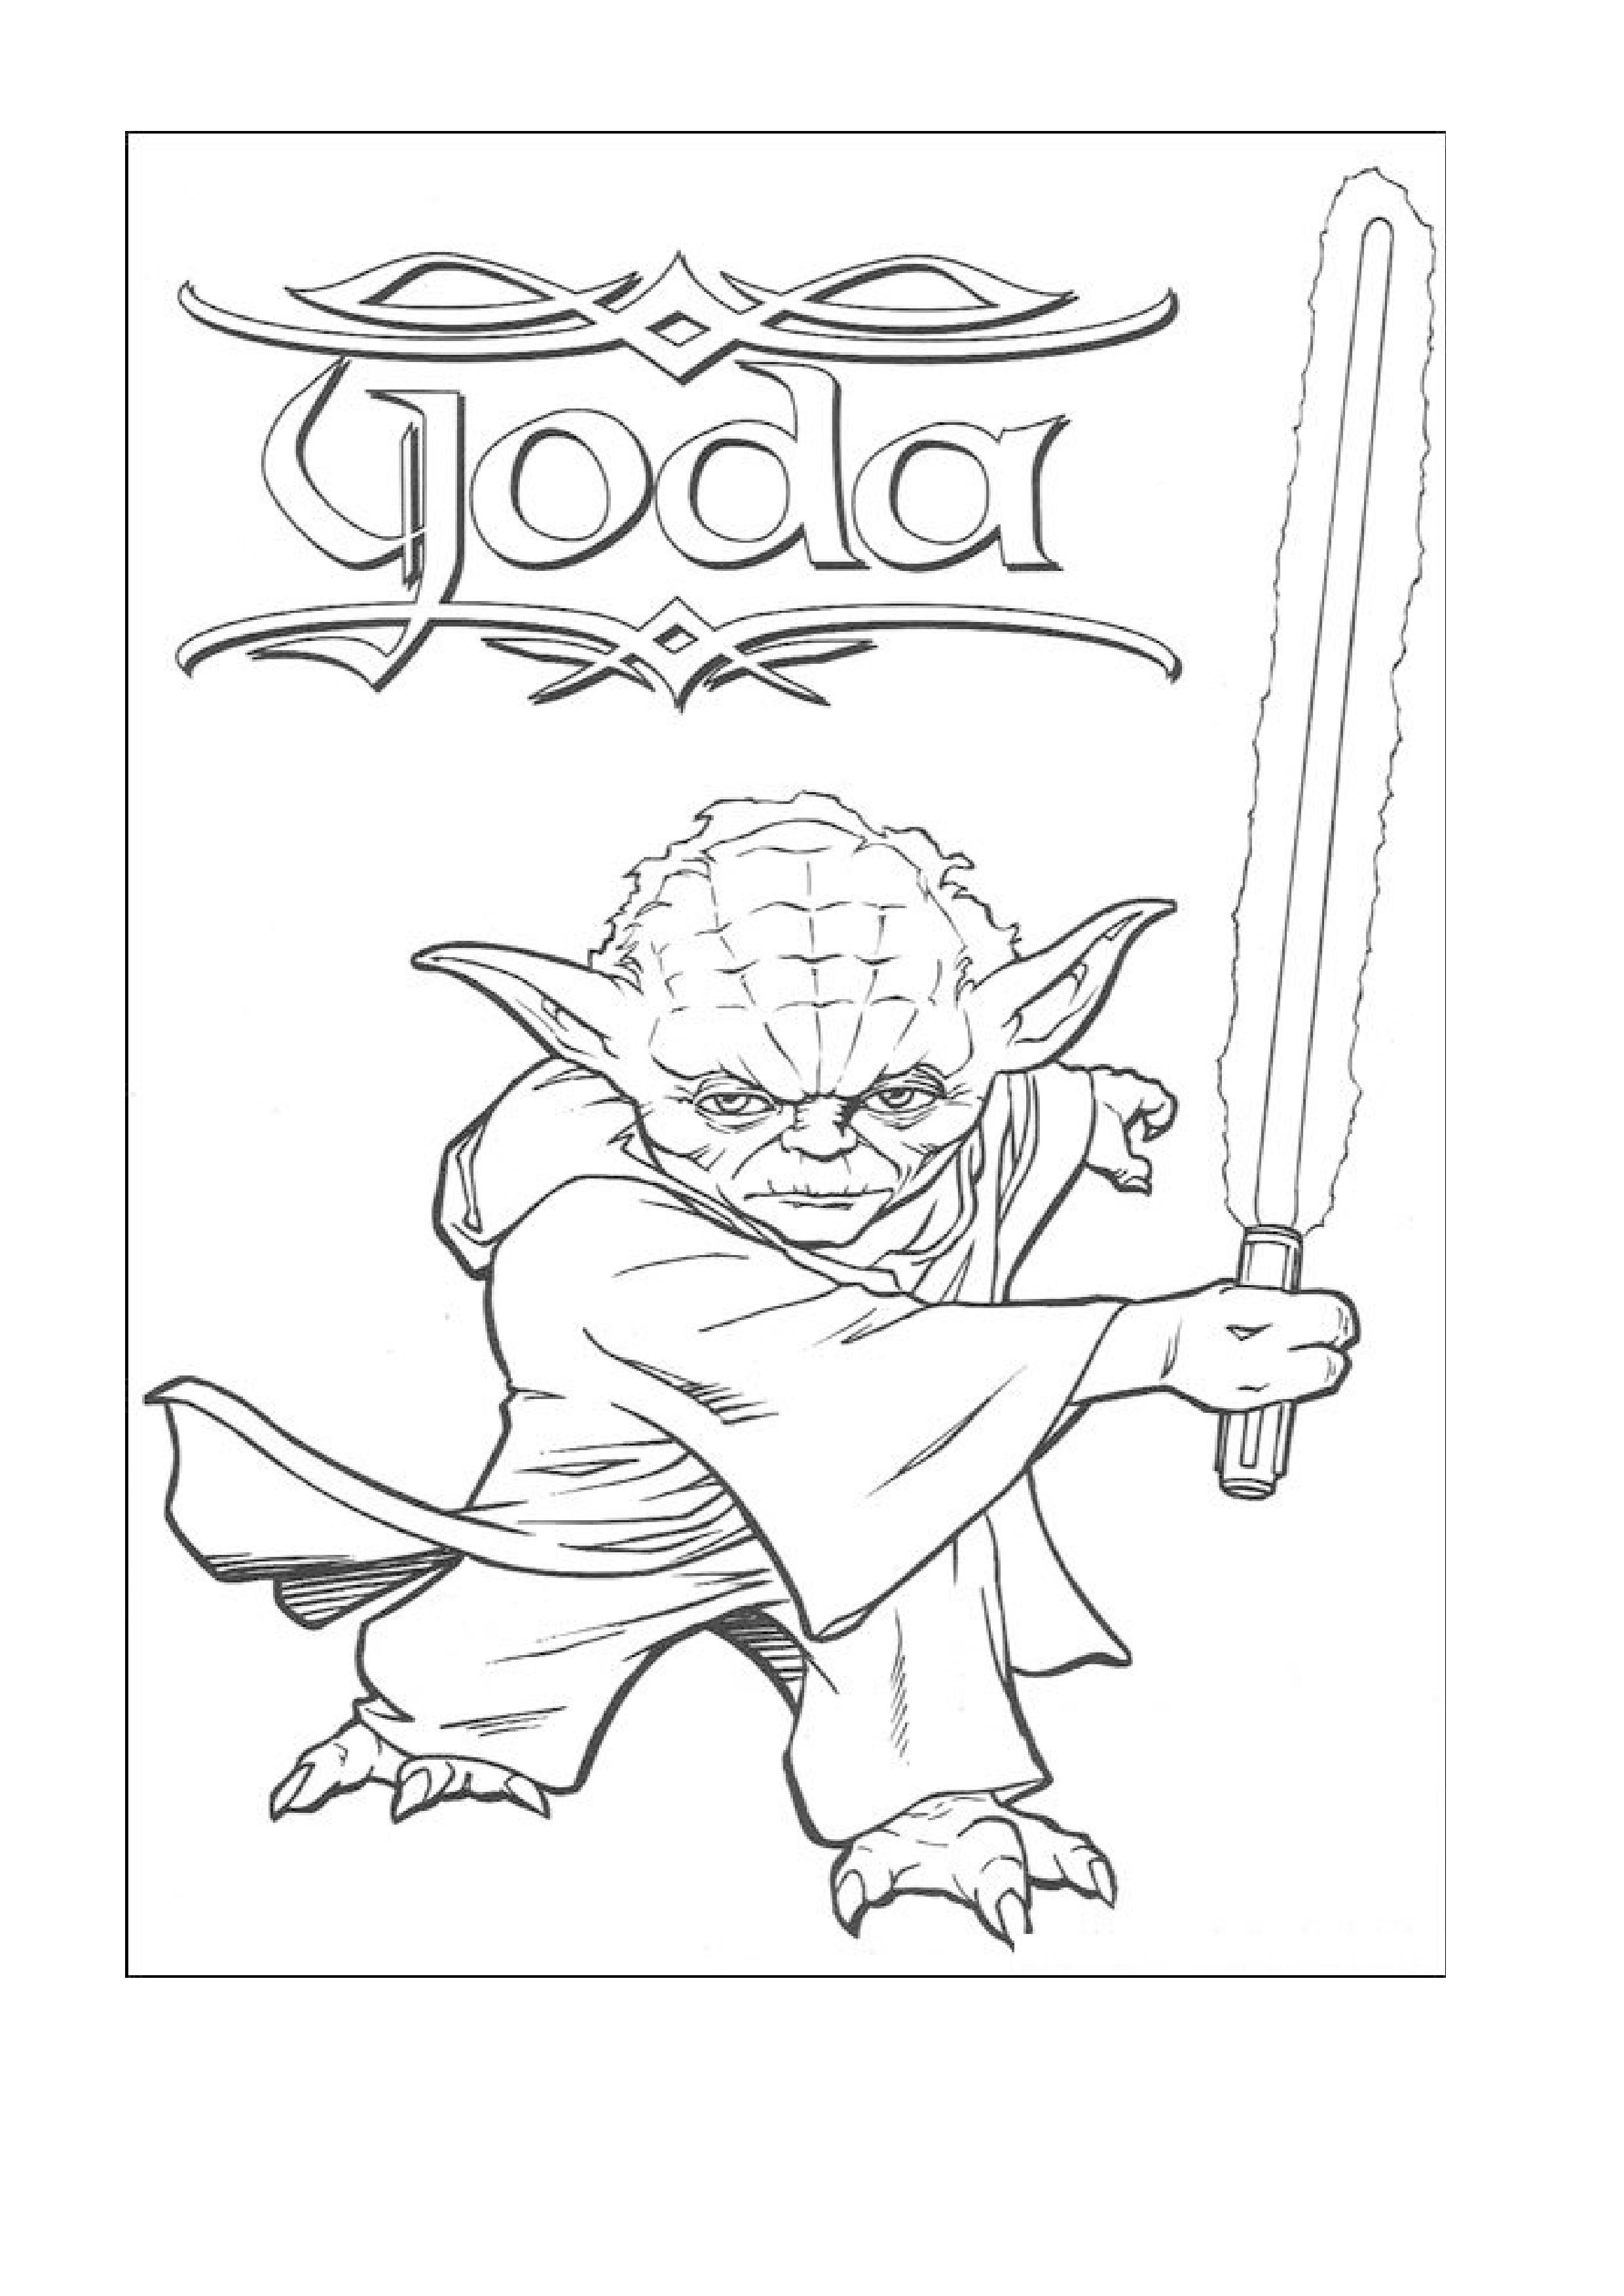 Star Wars Coloring Pages Printable  Star Wars Coloring Pages Free Printable Star Wars